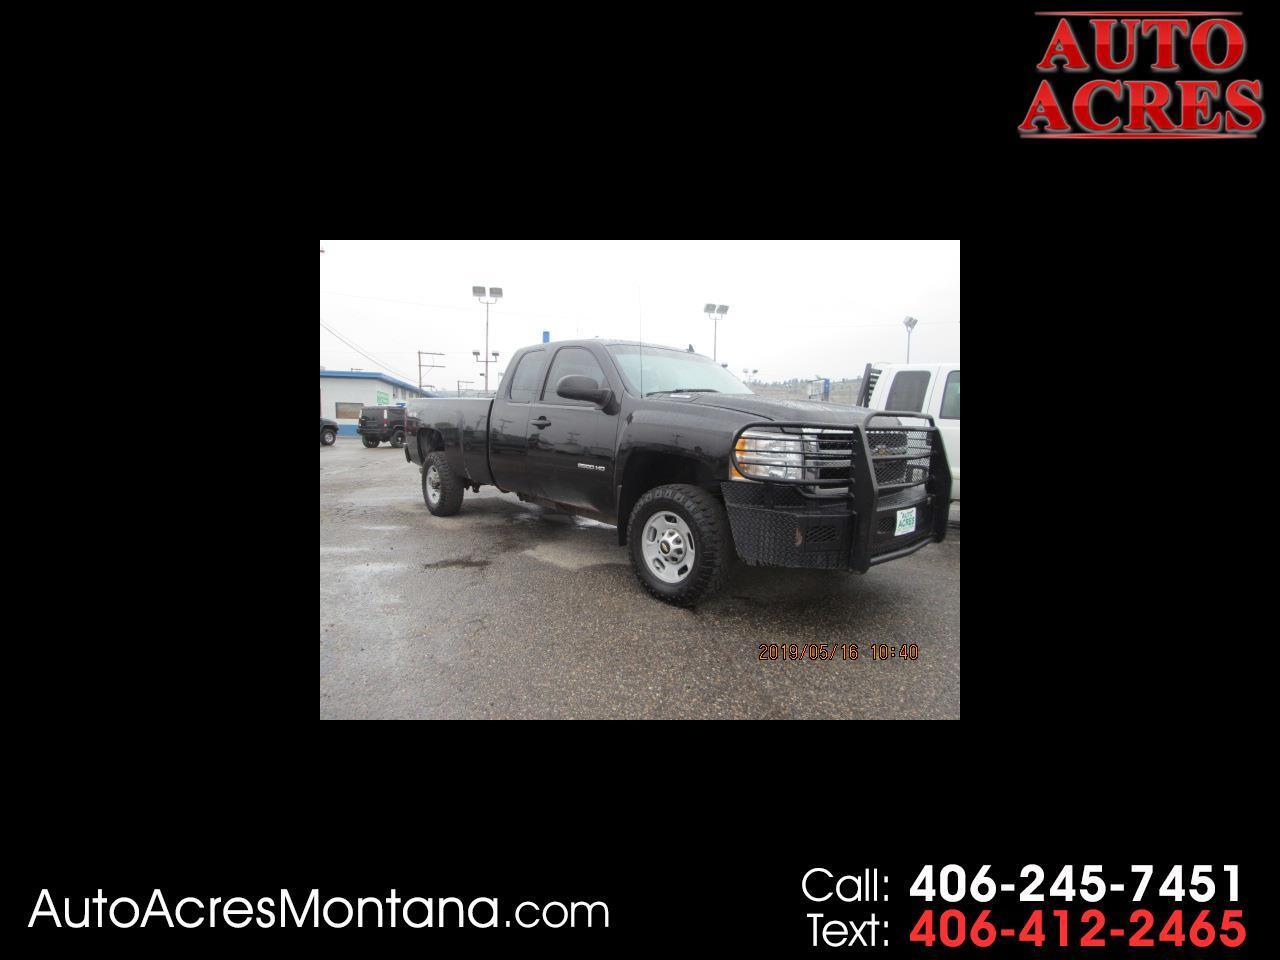 "2012 Chevrolet Silverado 2500HD 4WD Ext Cab 158.2"" Work Truck"